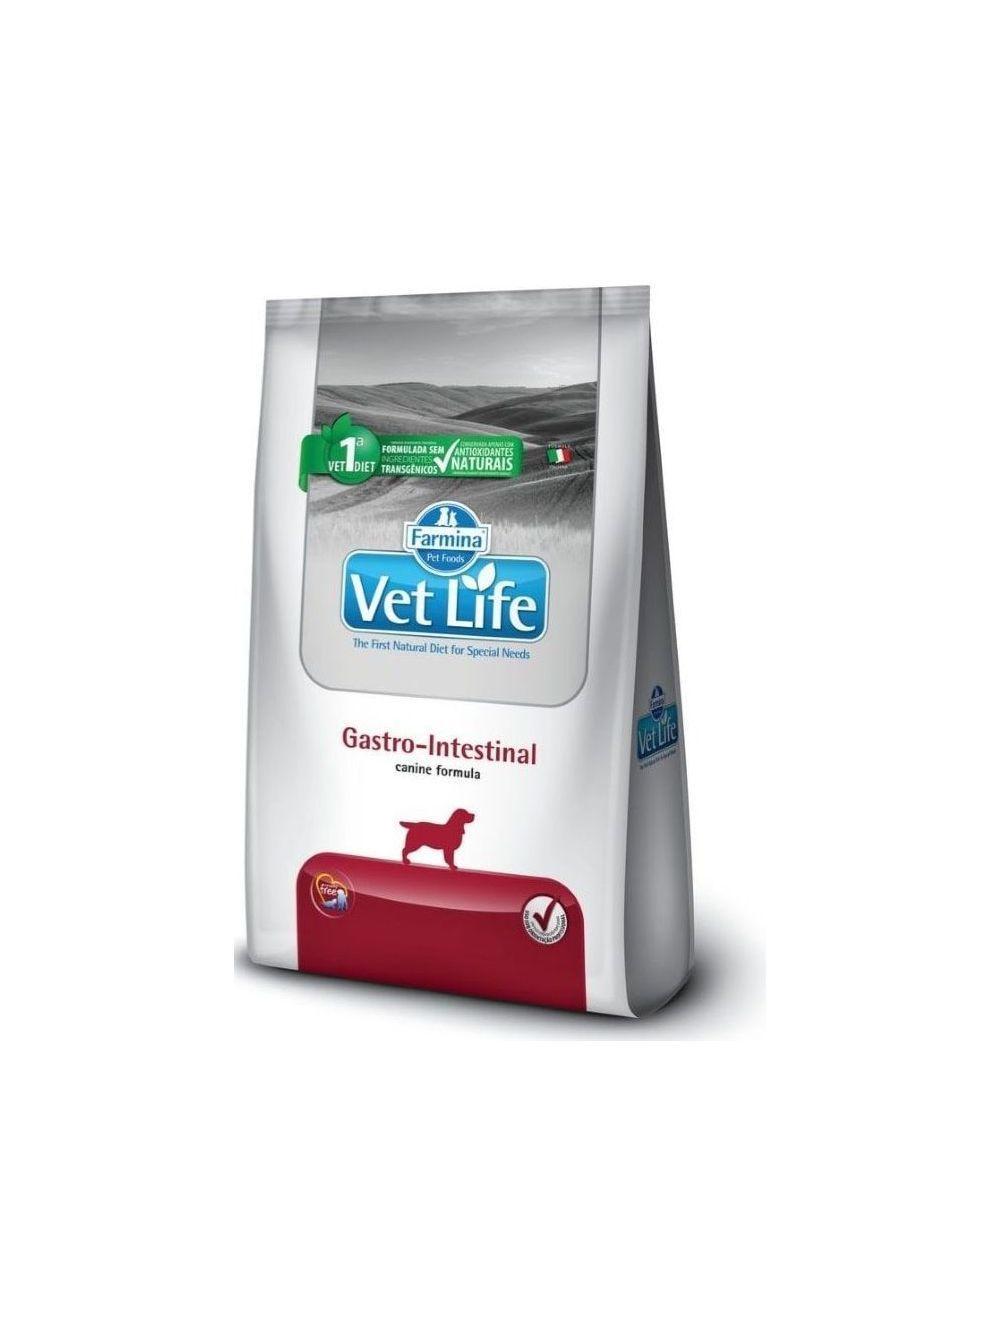 Vet Life Gastrointestinal para Perros